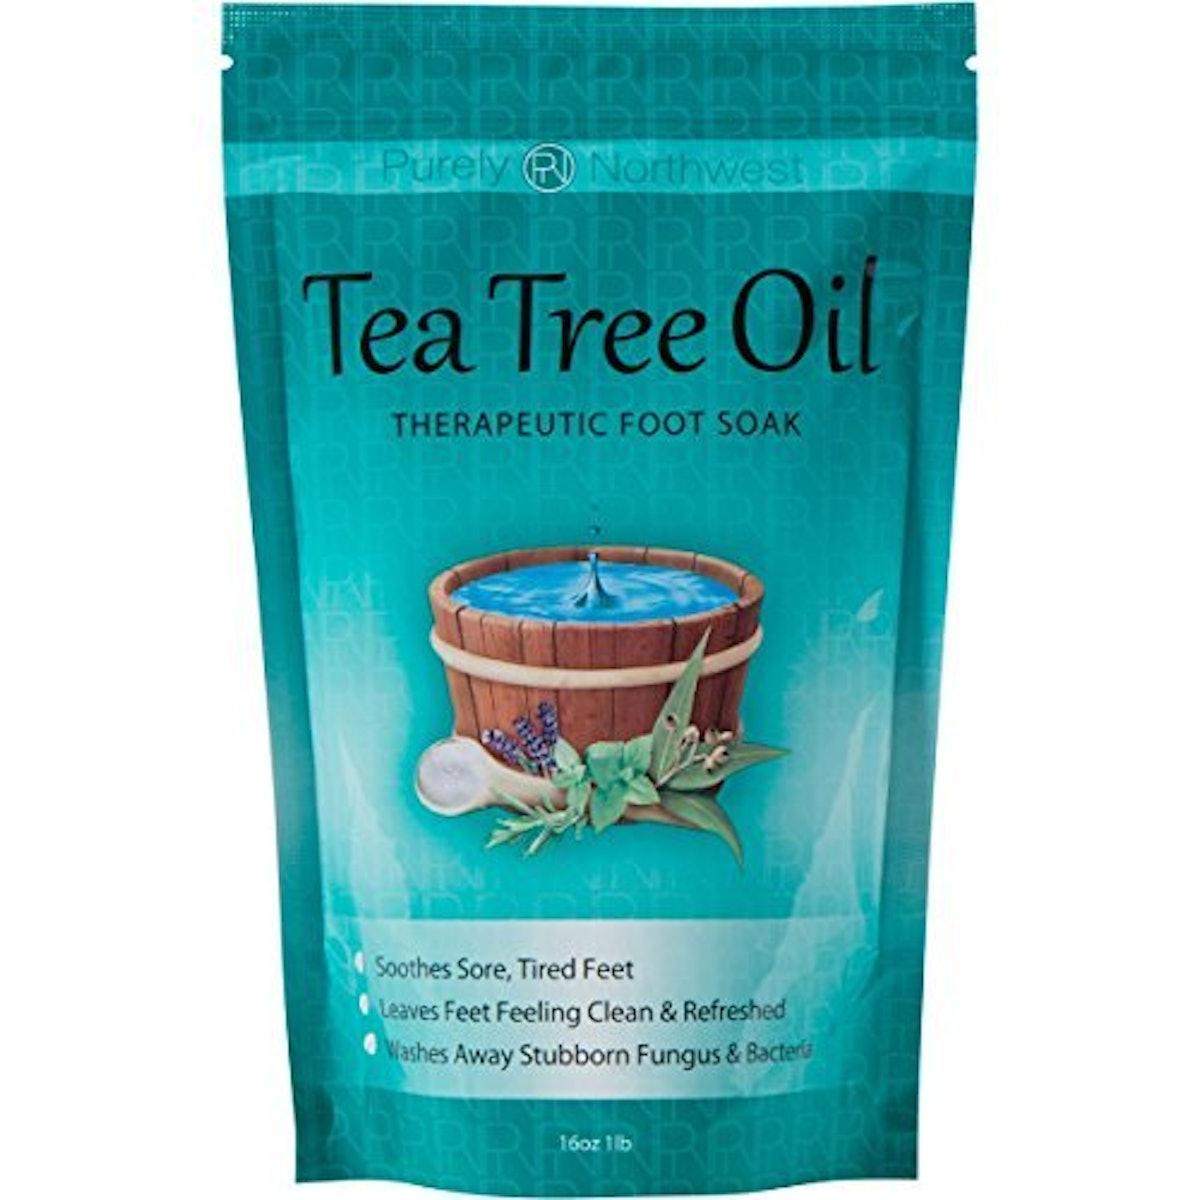 Purely Northwest Tea Tree Oil Foot Soak (16 Ounces)